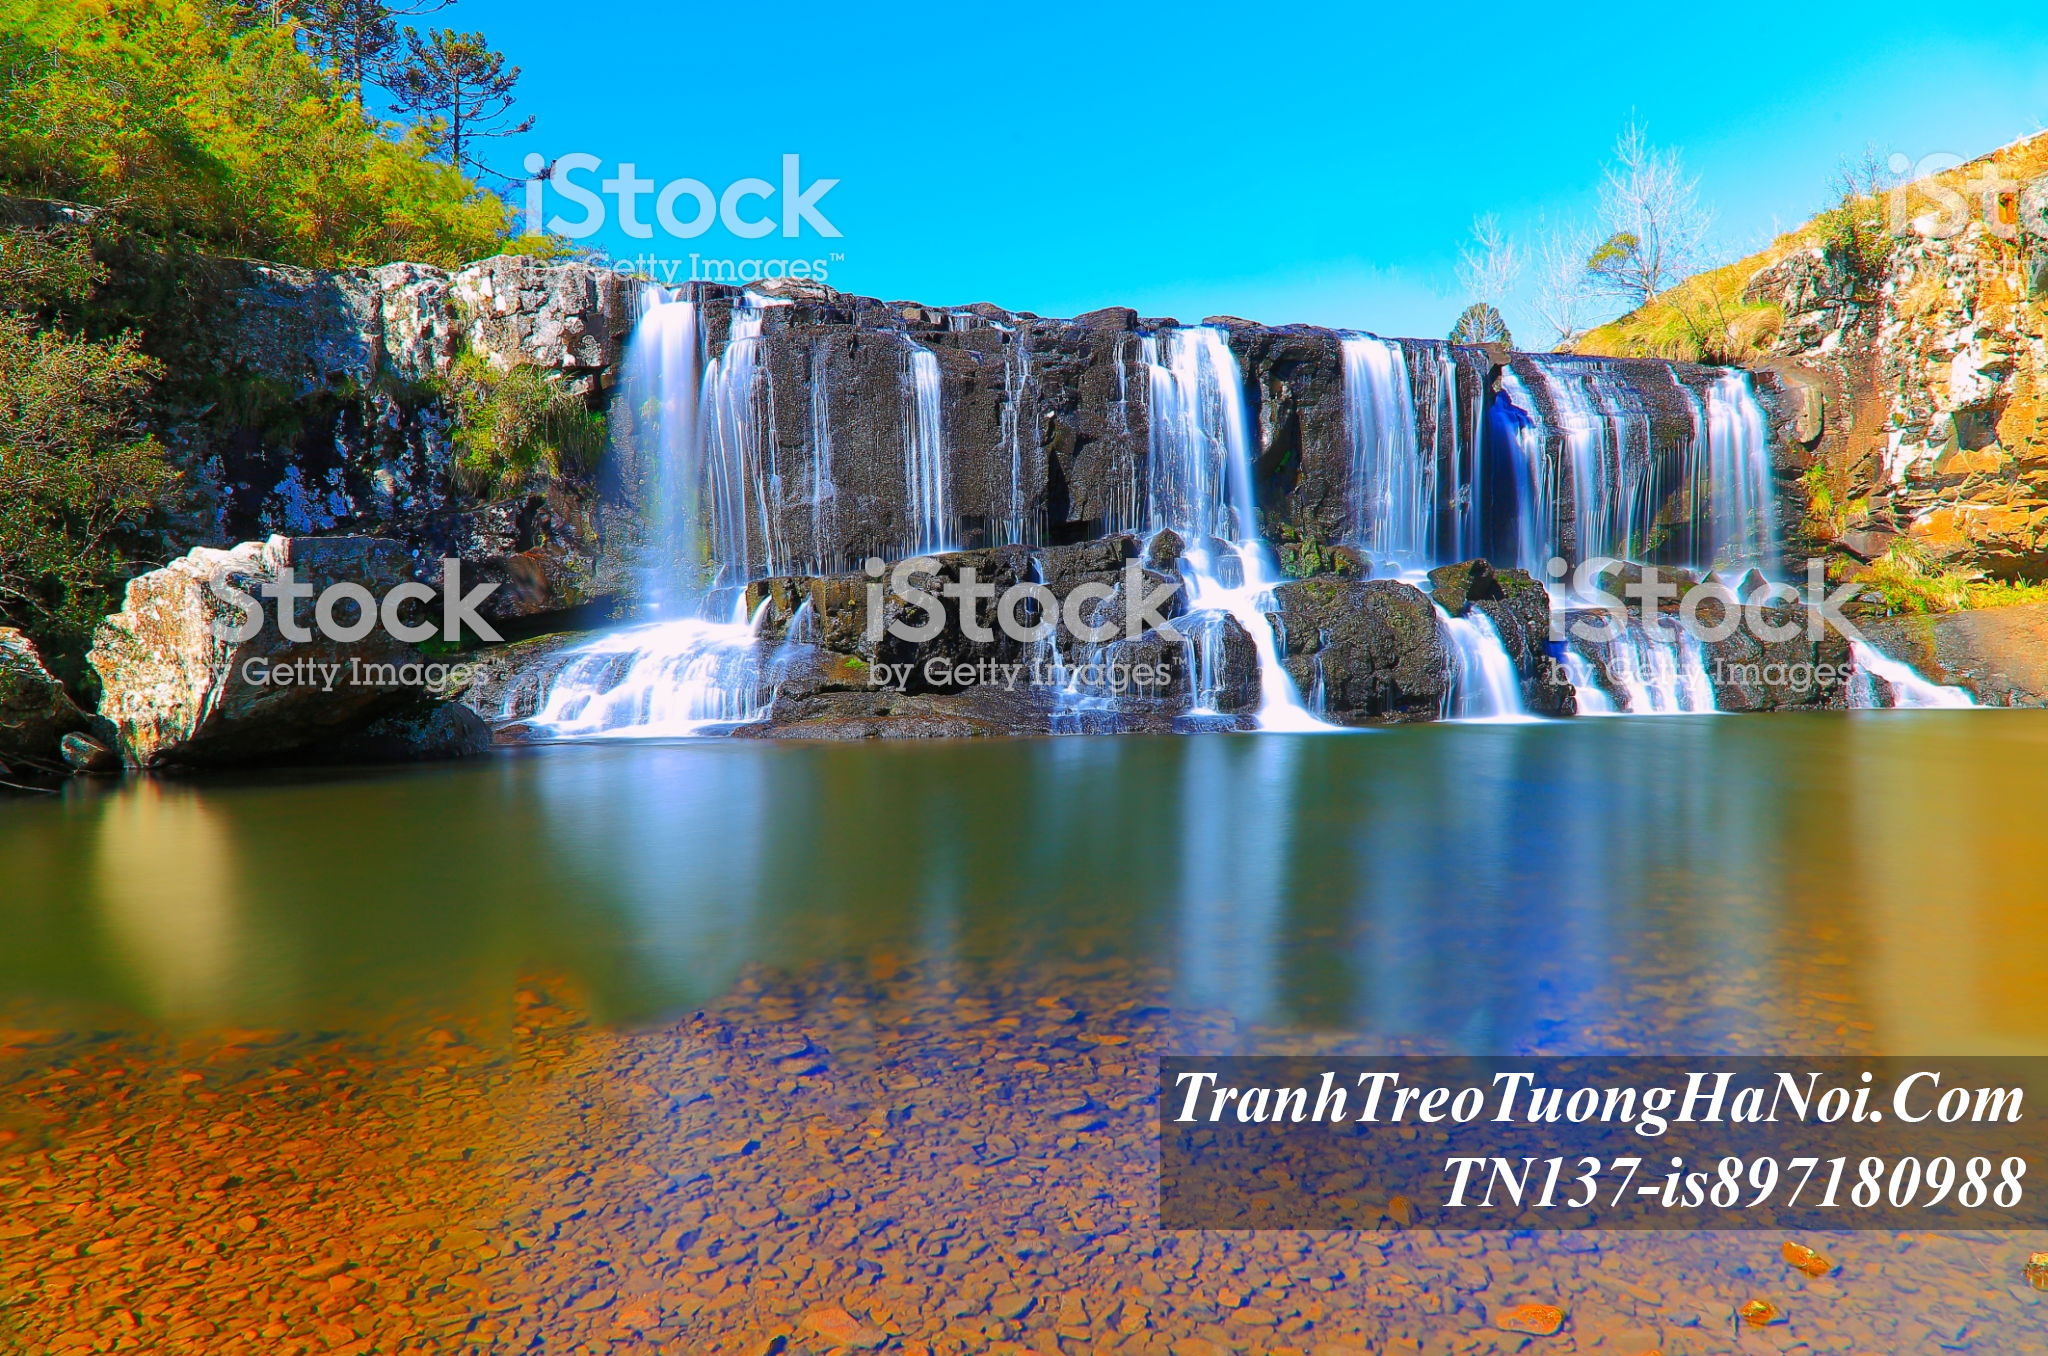 Phong canh thac nuoc dep do xuong song ho amia TN137-is897180988-Croatia